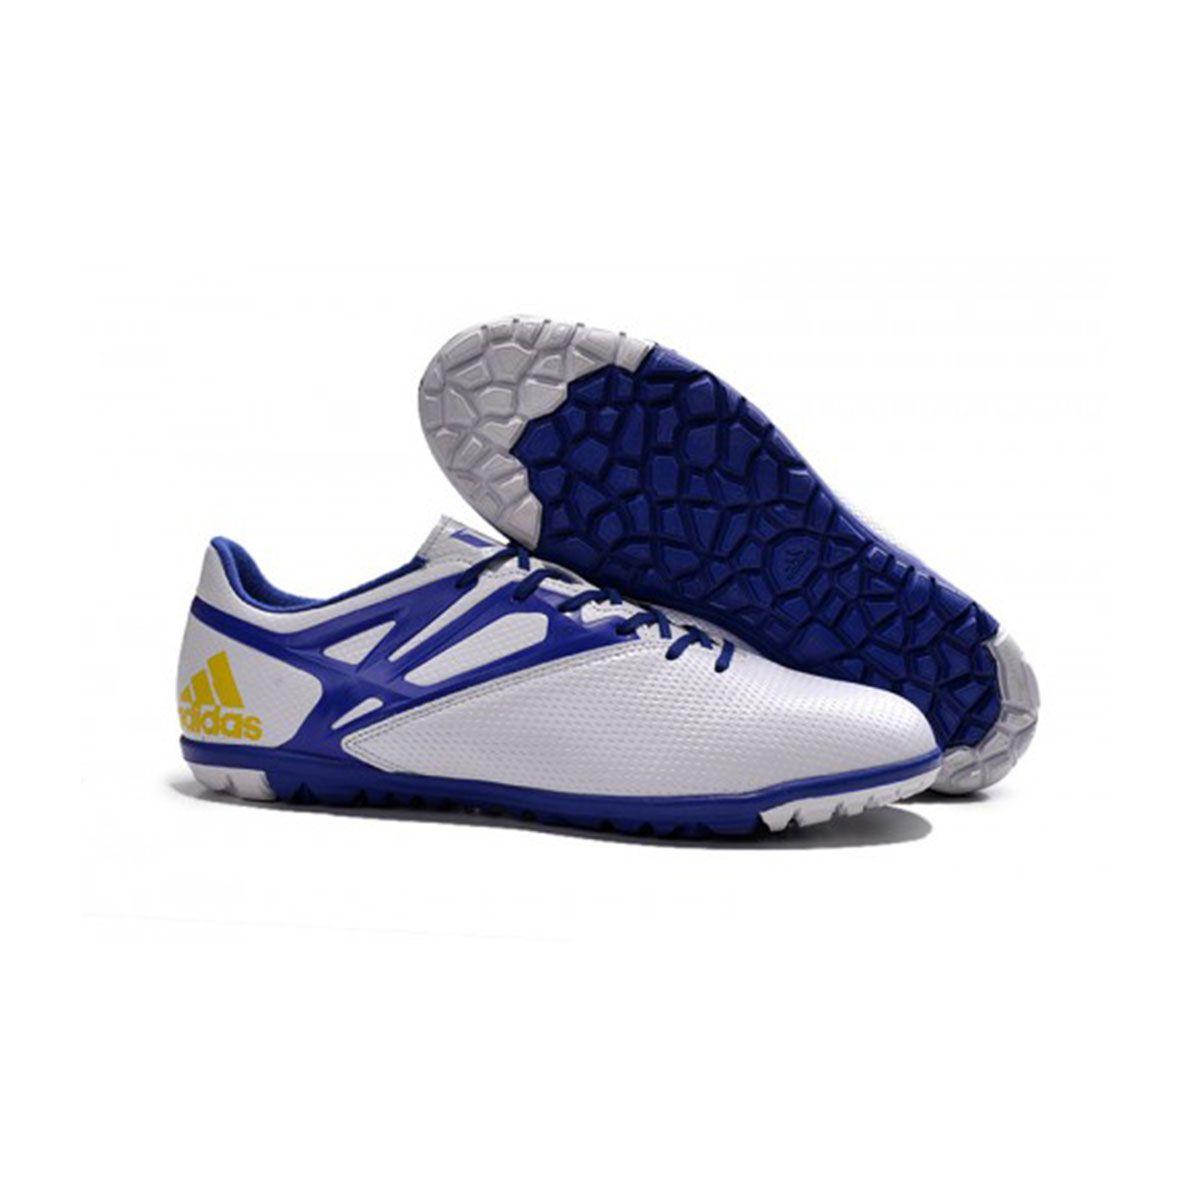 Chuteira Society Adidas Messi 15.3 TF